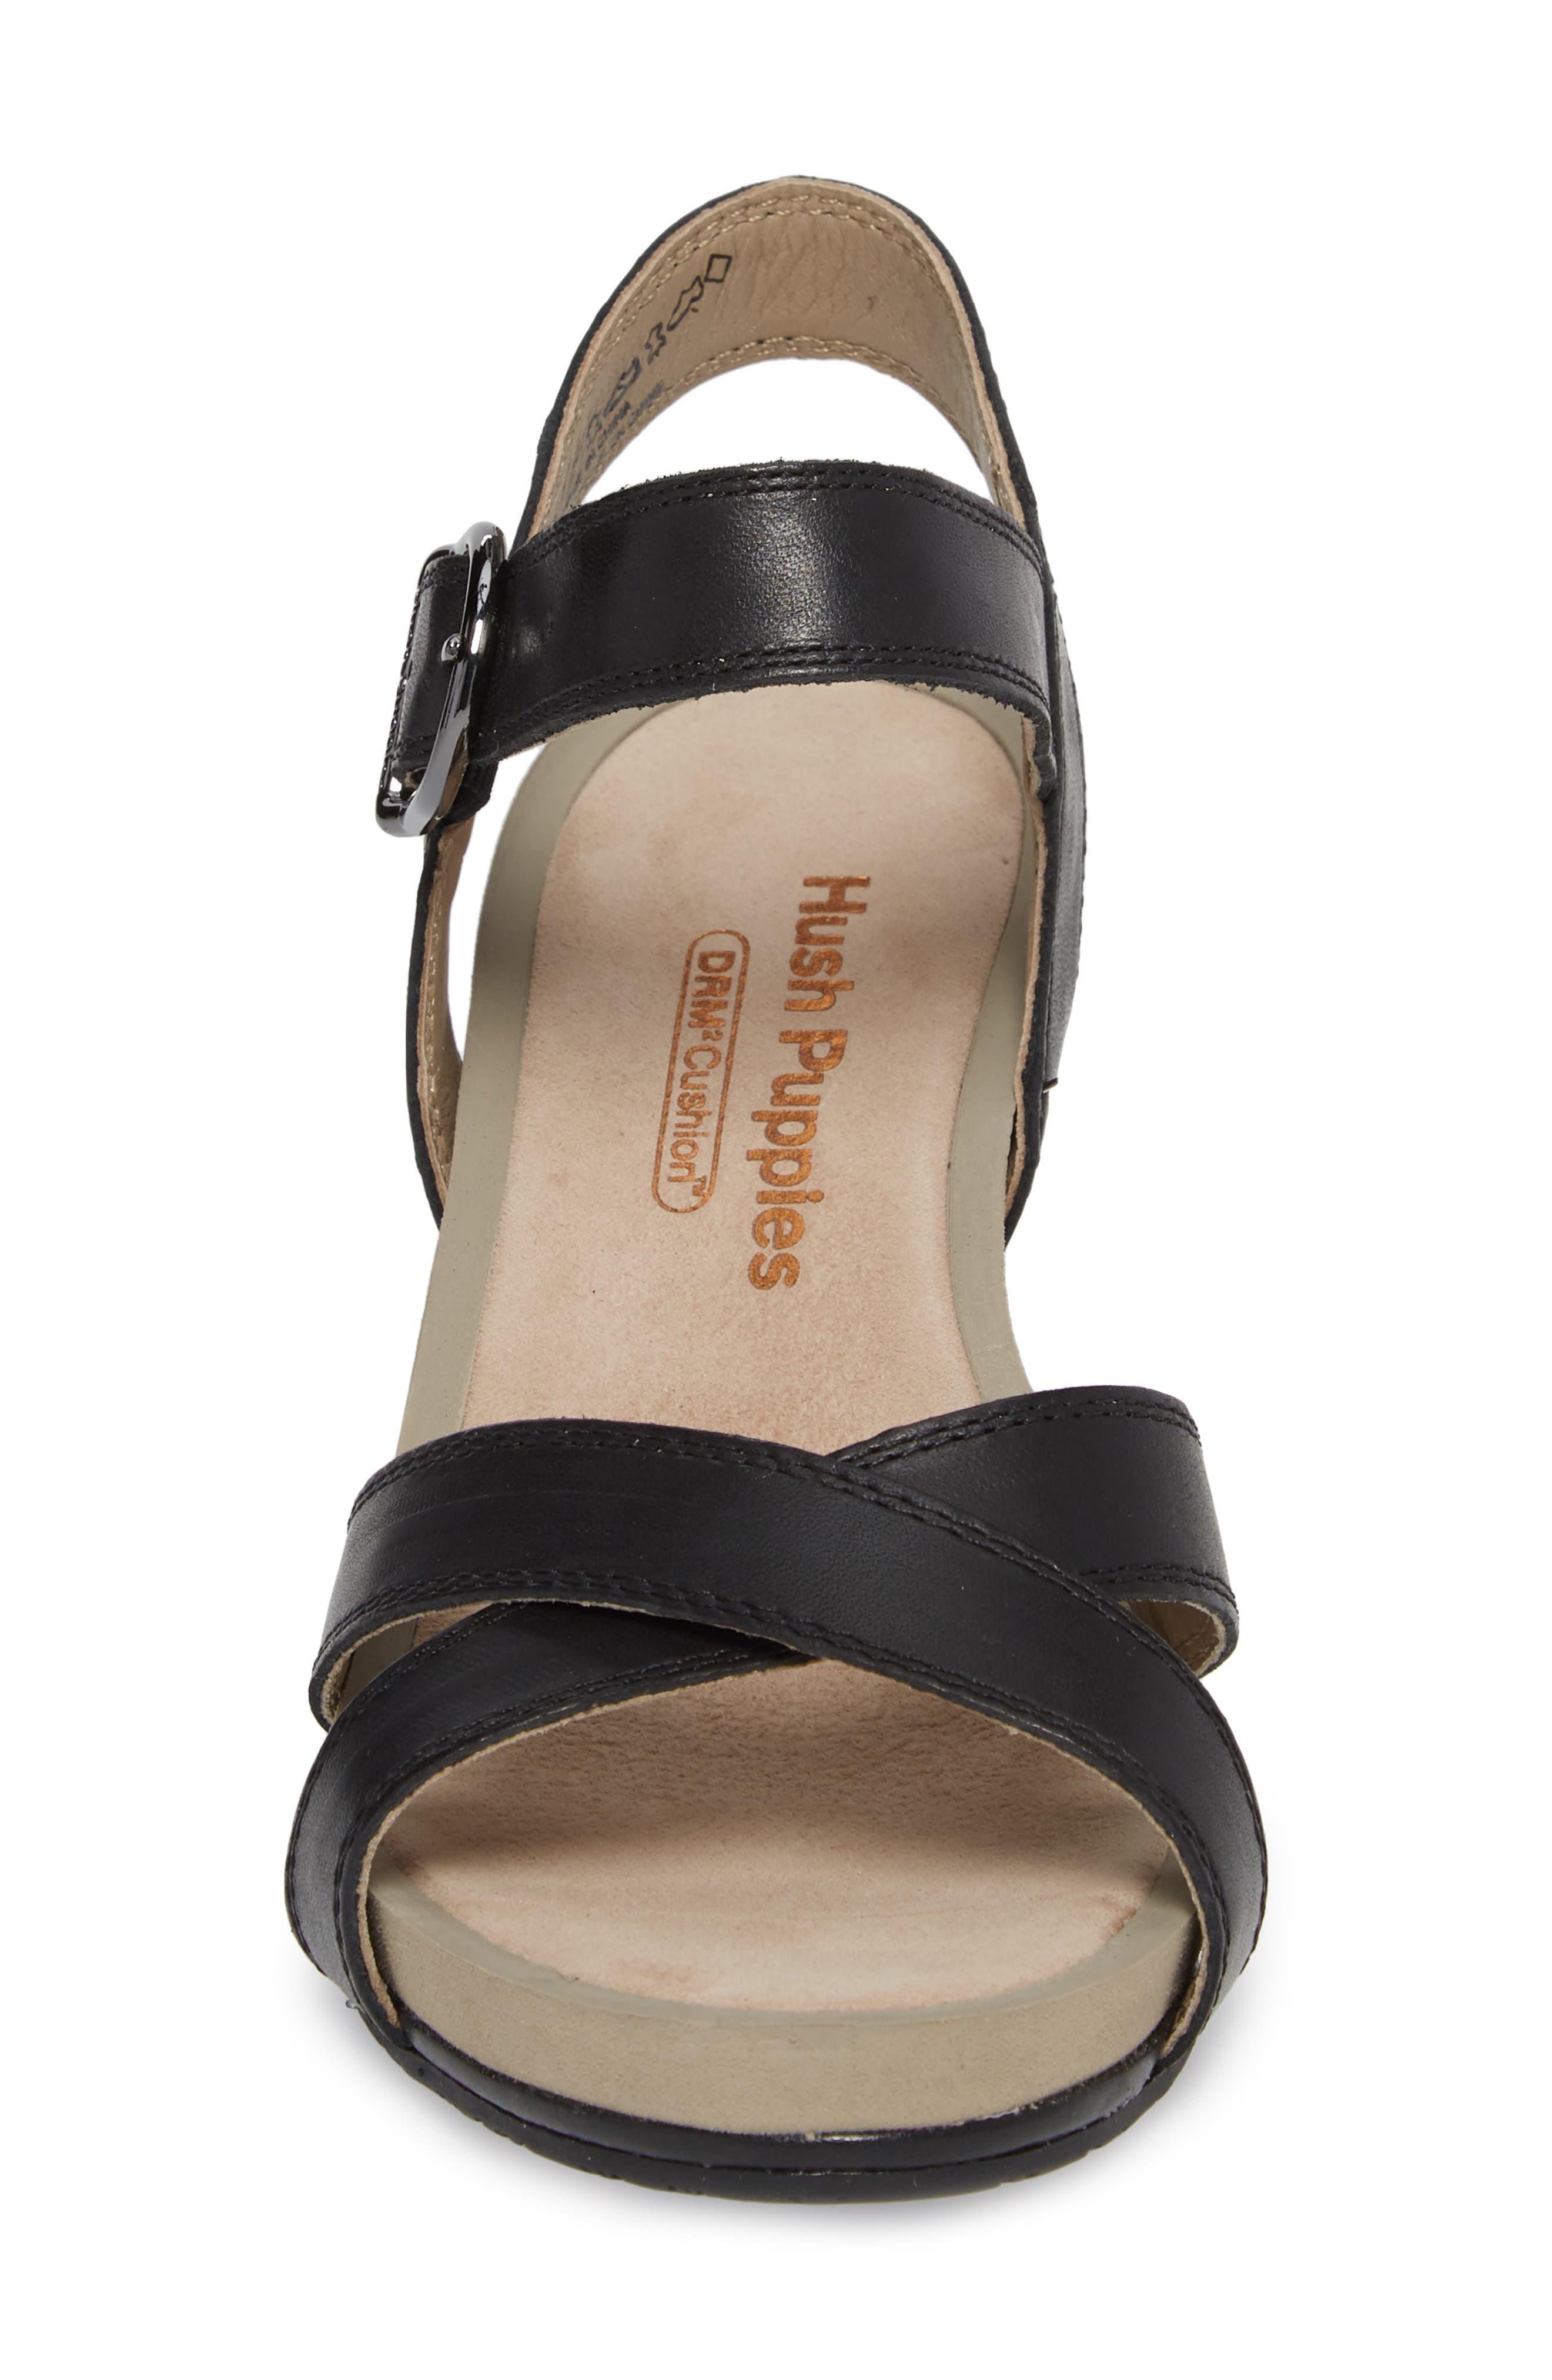 Mariska Block Heel Sandal,                             Alternate thumbnail 4, color,                             Black Leather